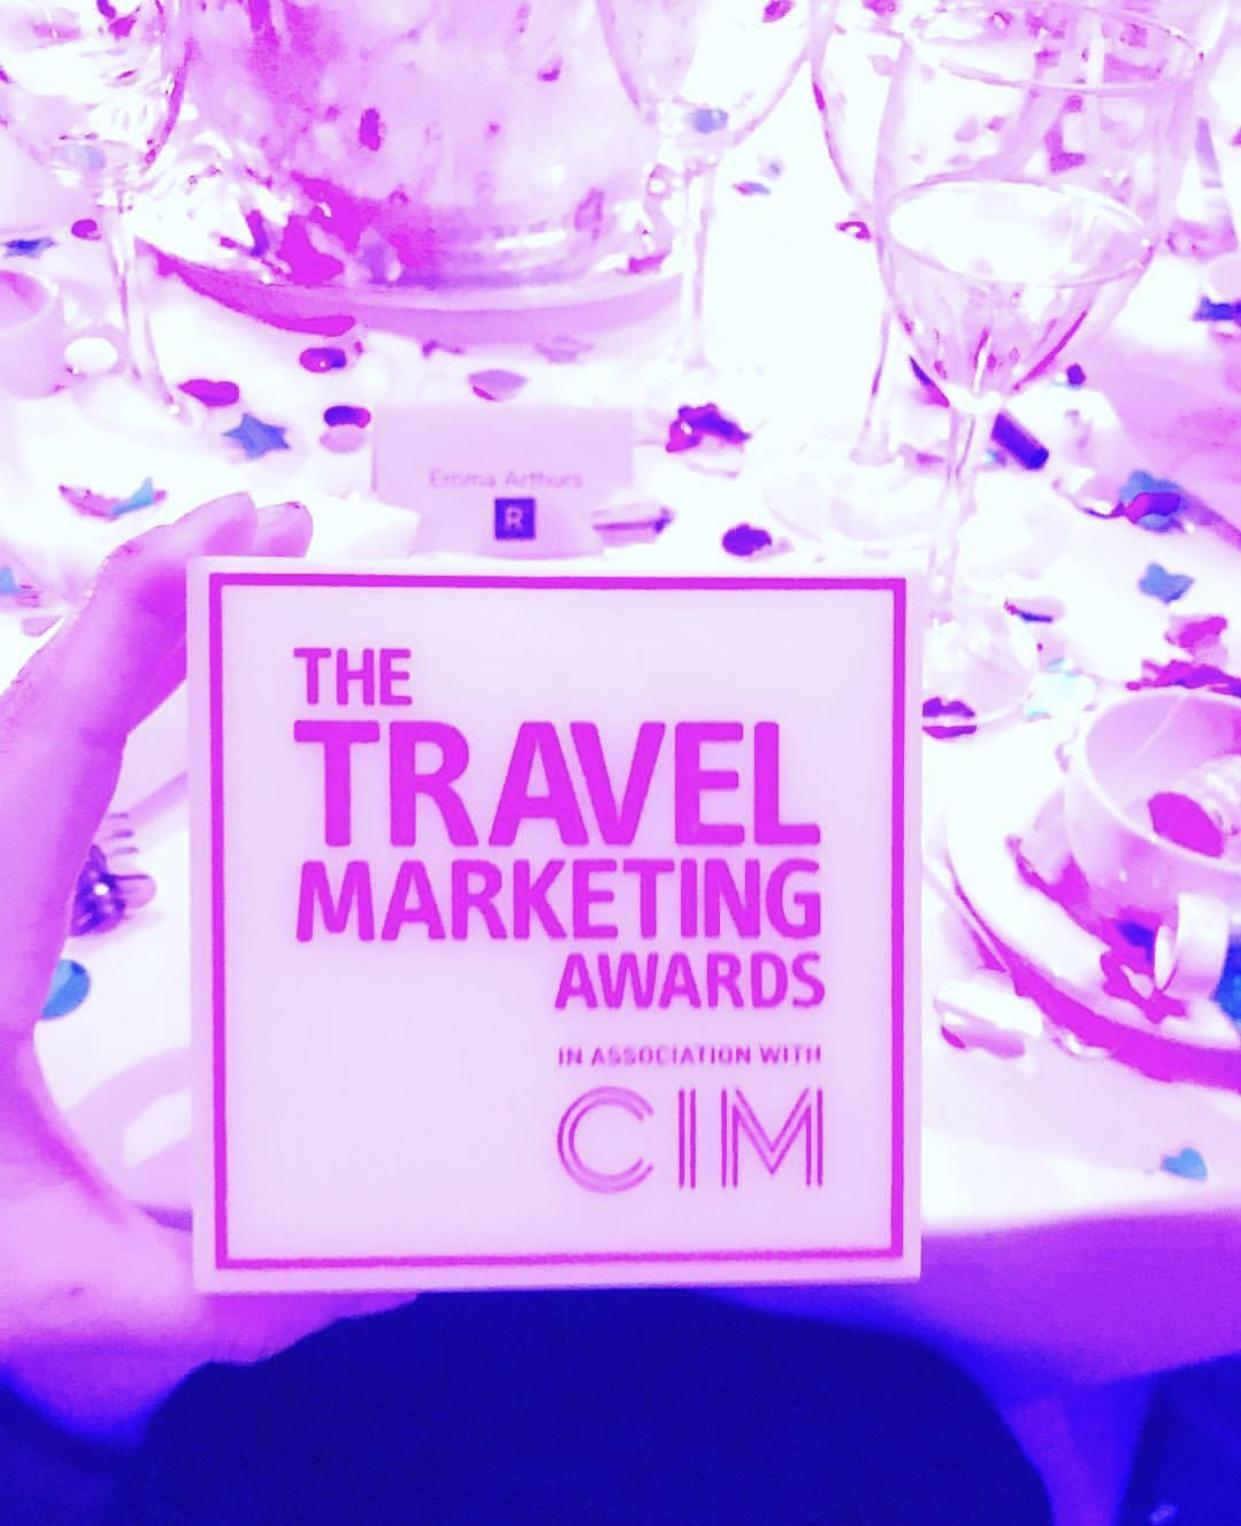 The Travel Marketing Awards 2019